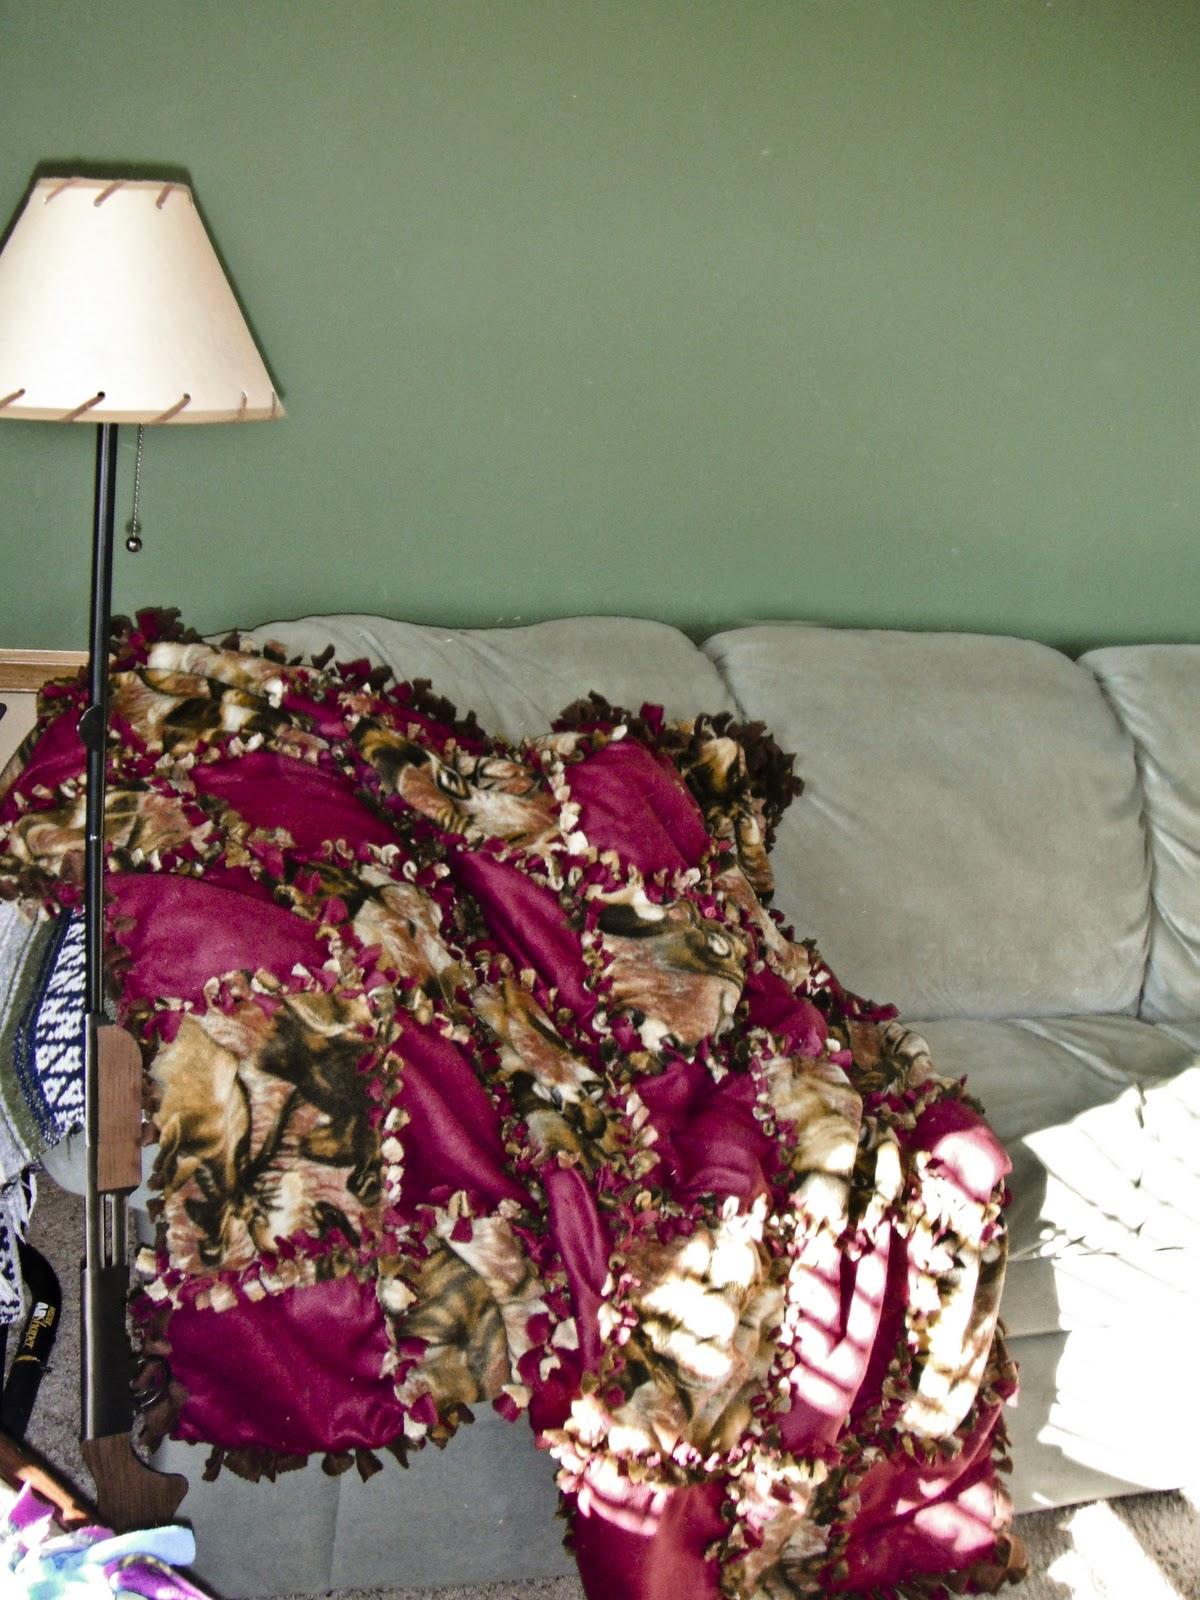 Simply In A Fish Bowl Quilt Block Fleece Tie Blanket Tutorial